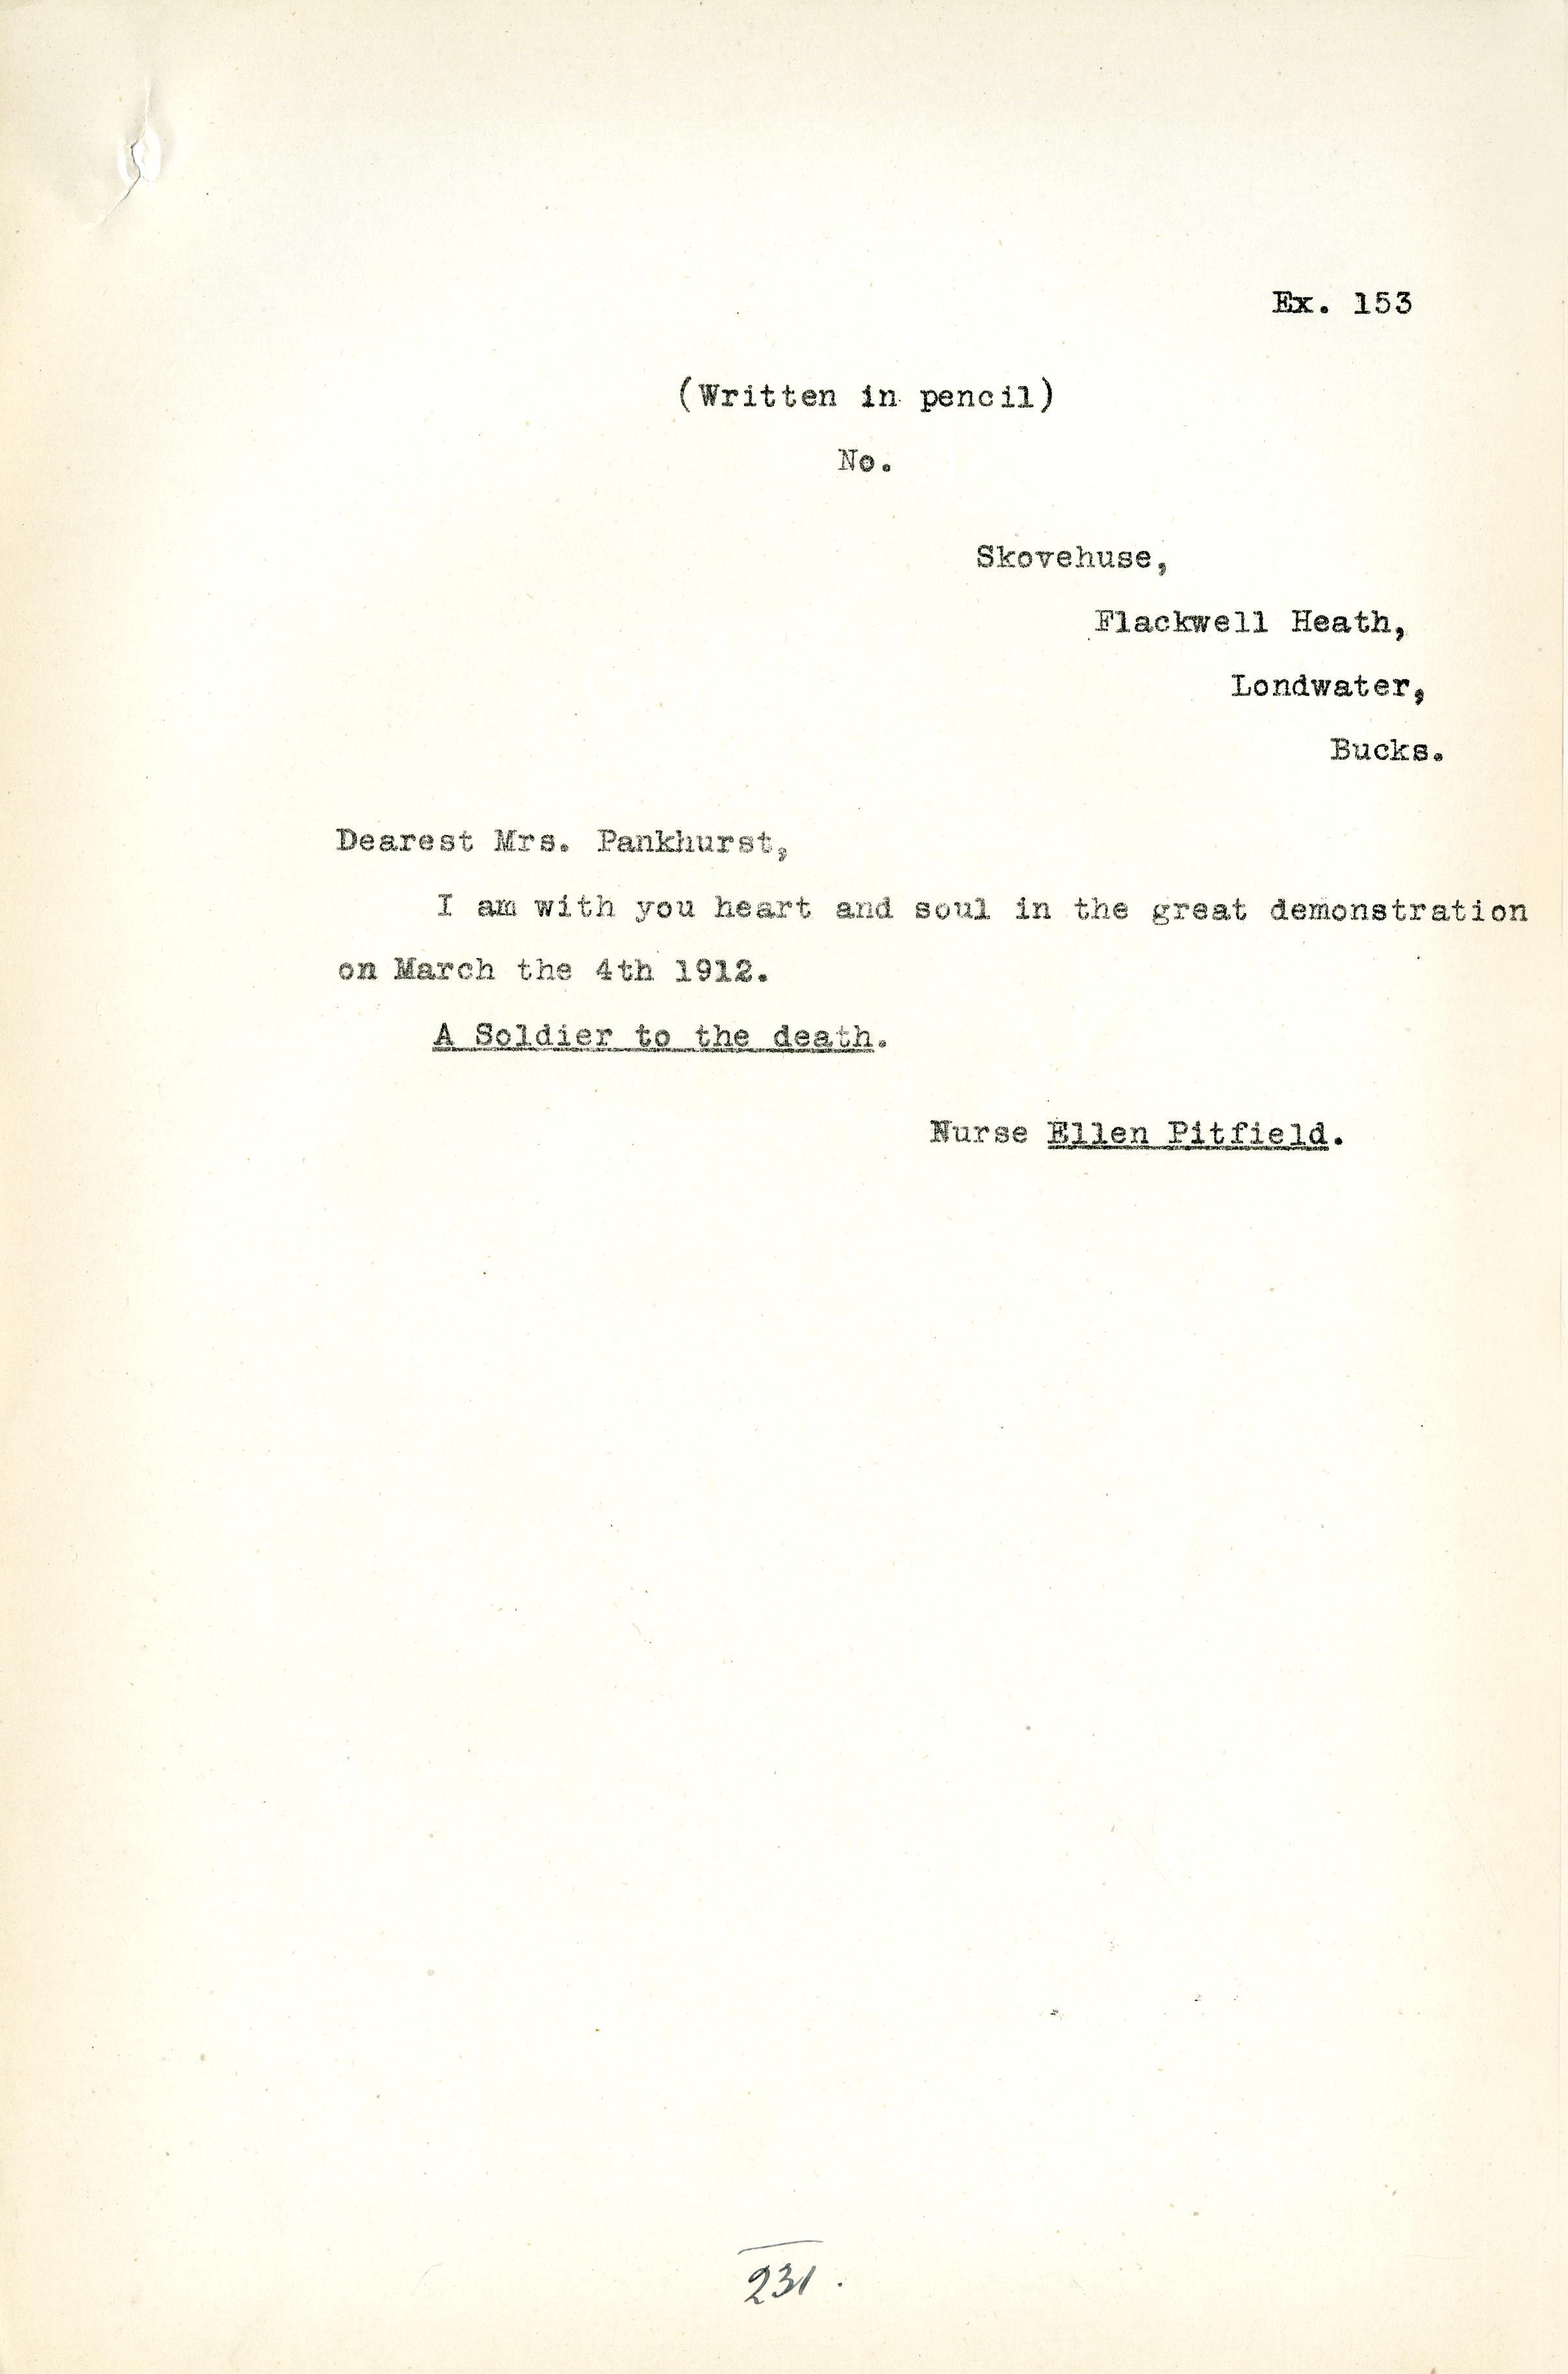 Copy of letter from Nurse Ellen Pitfield 1912 DPP1/23 Ex153